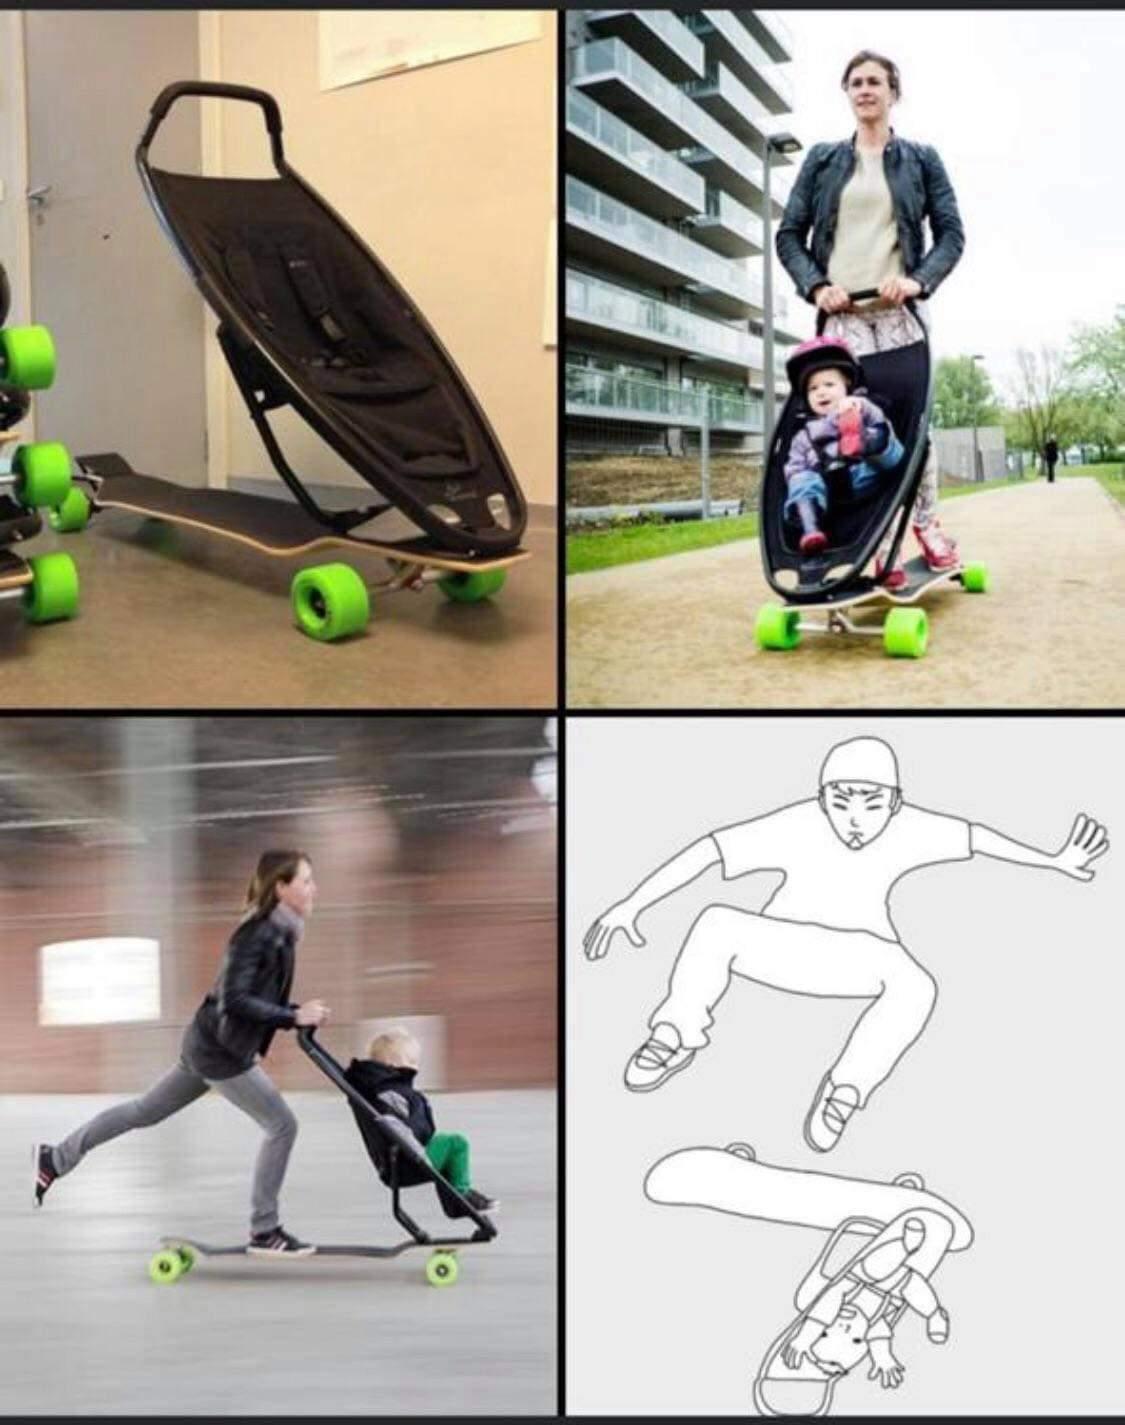 Plot twist: the kid's name is Ollie - meme